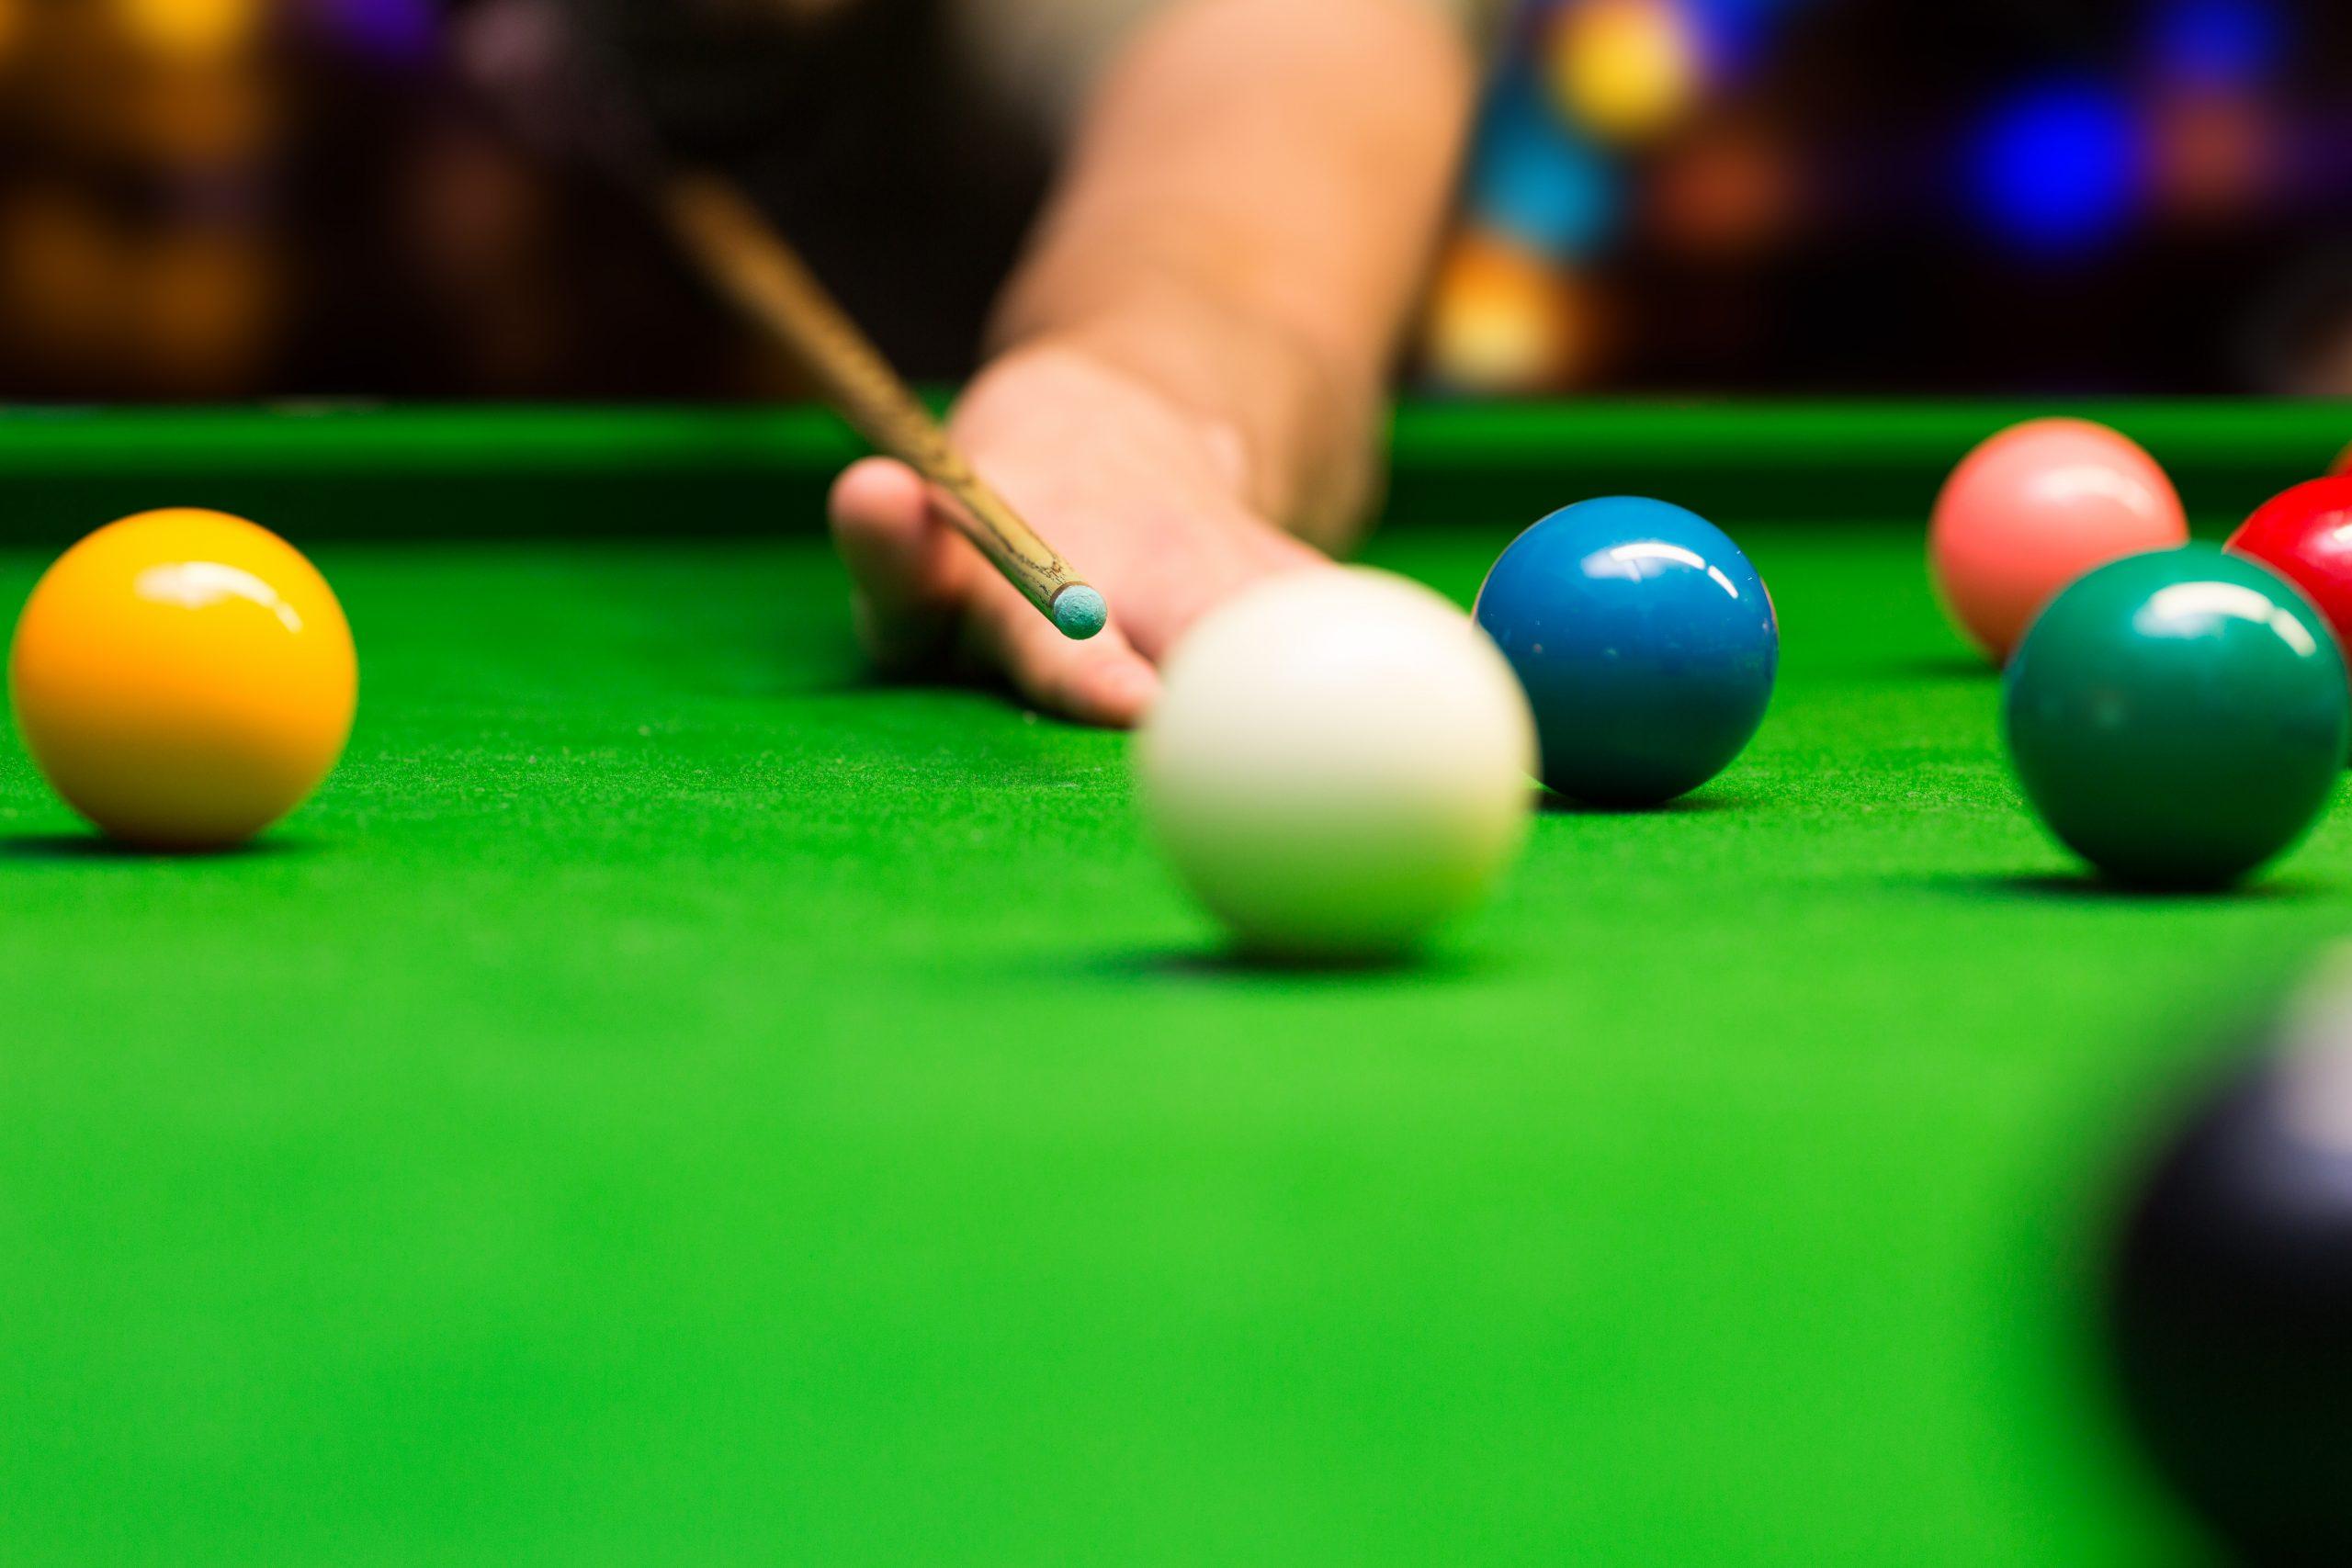 Šport Snooker